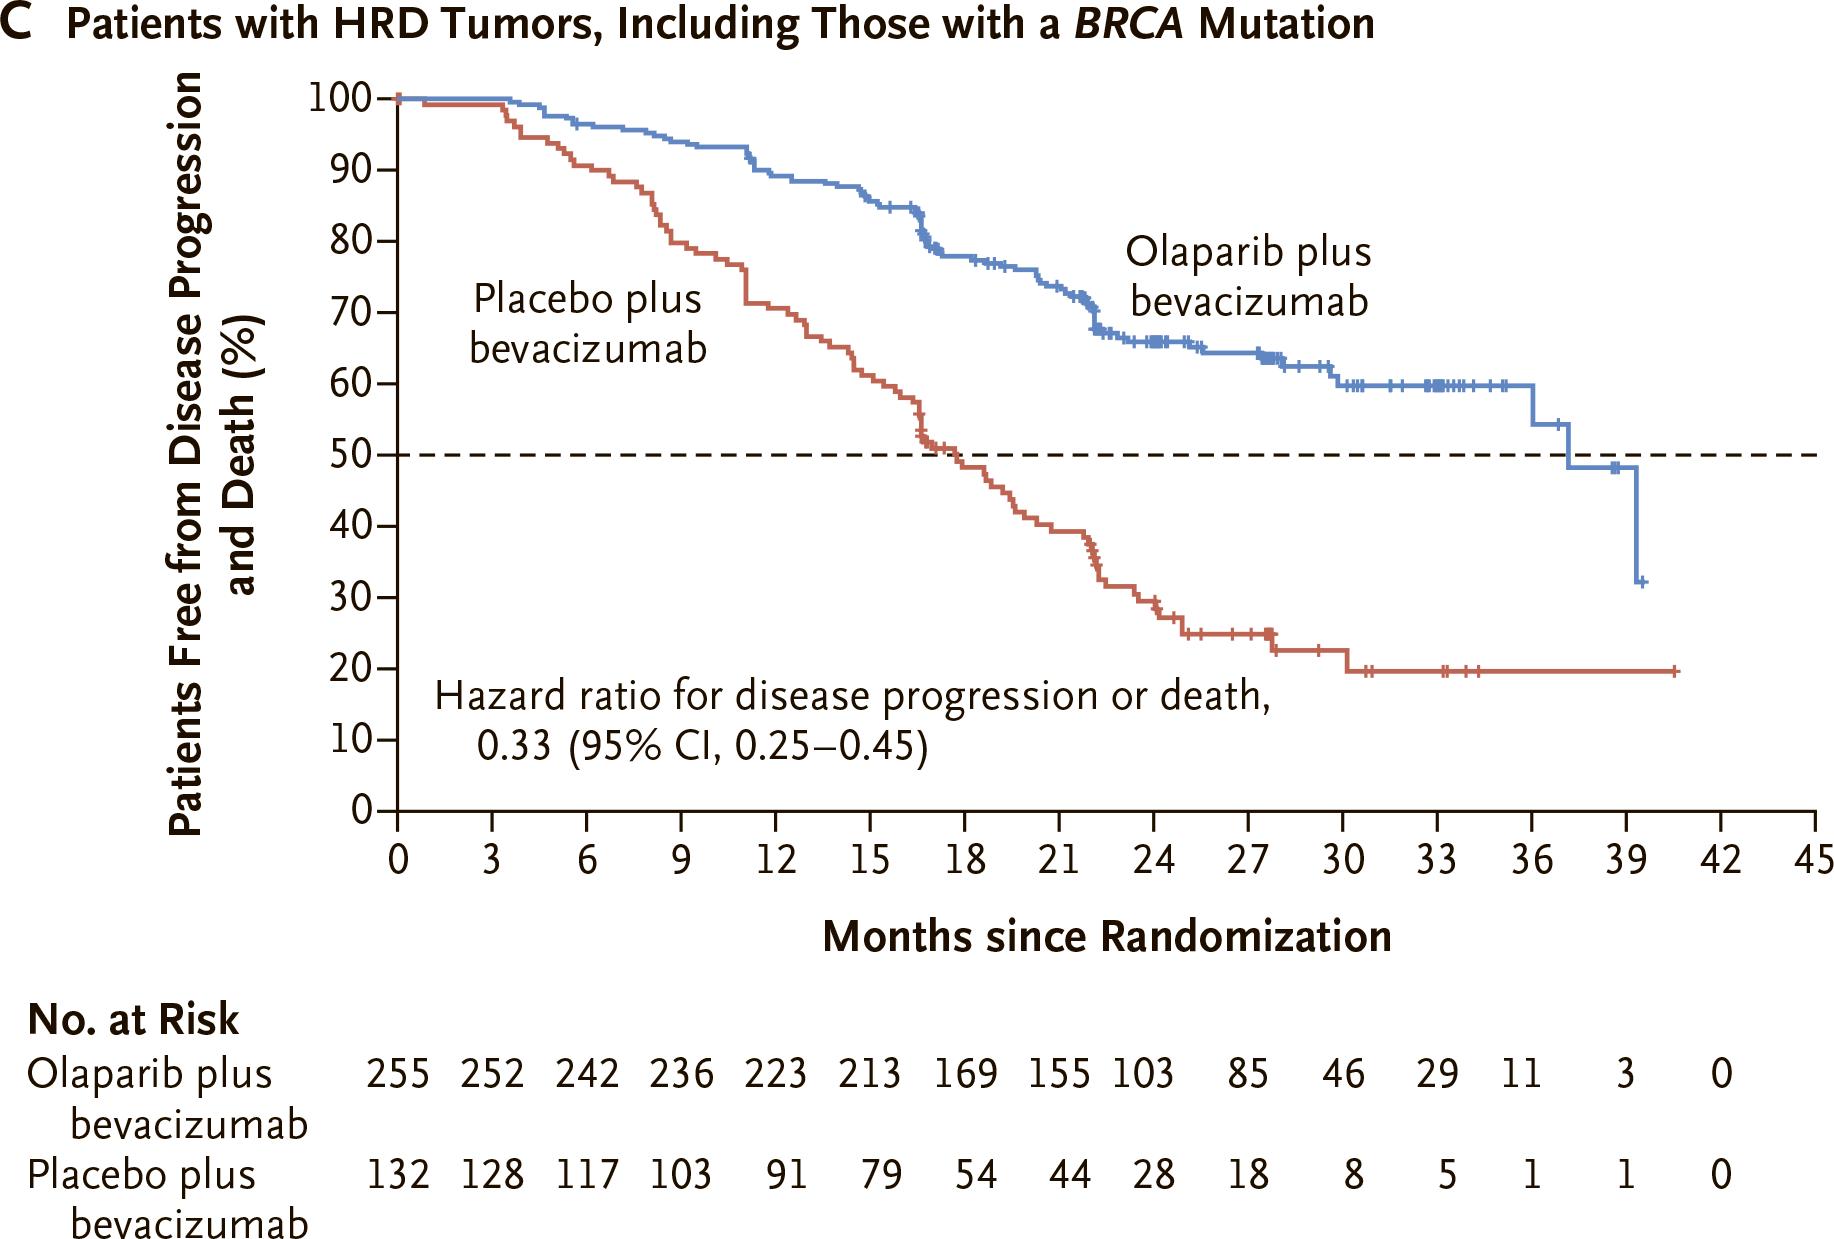 nct02477644 results 04 - «Линпарза» плюс «Авастин»: поддерживающая терапия рака яичников